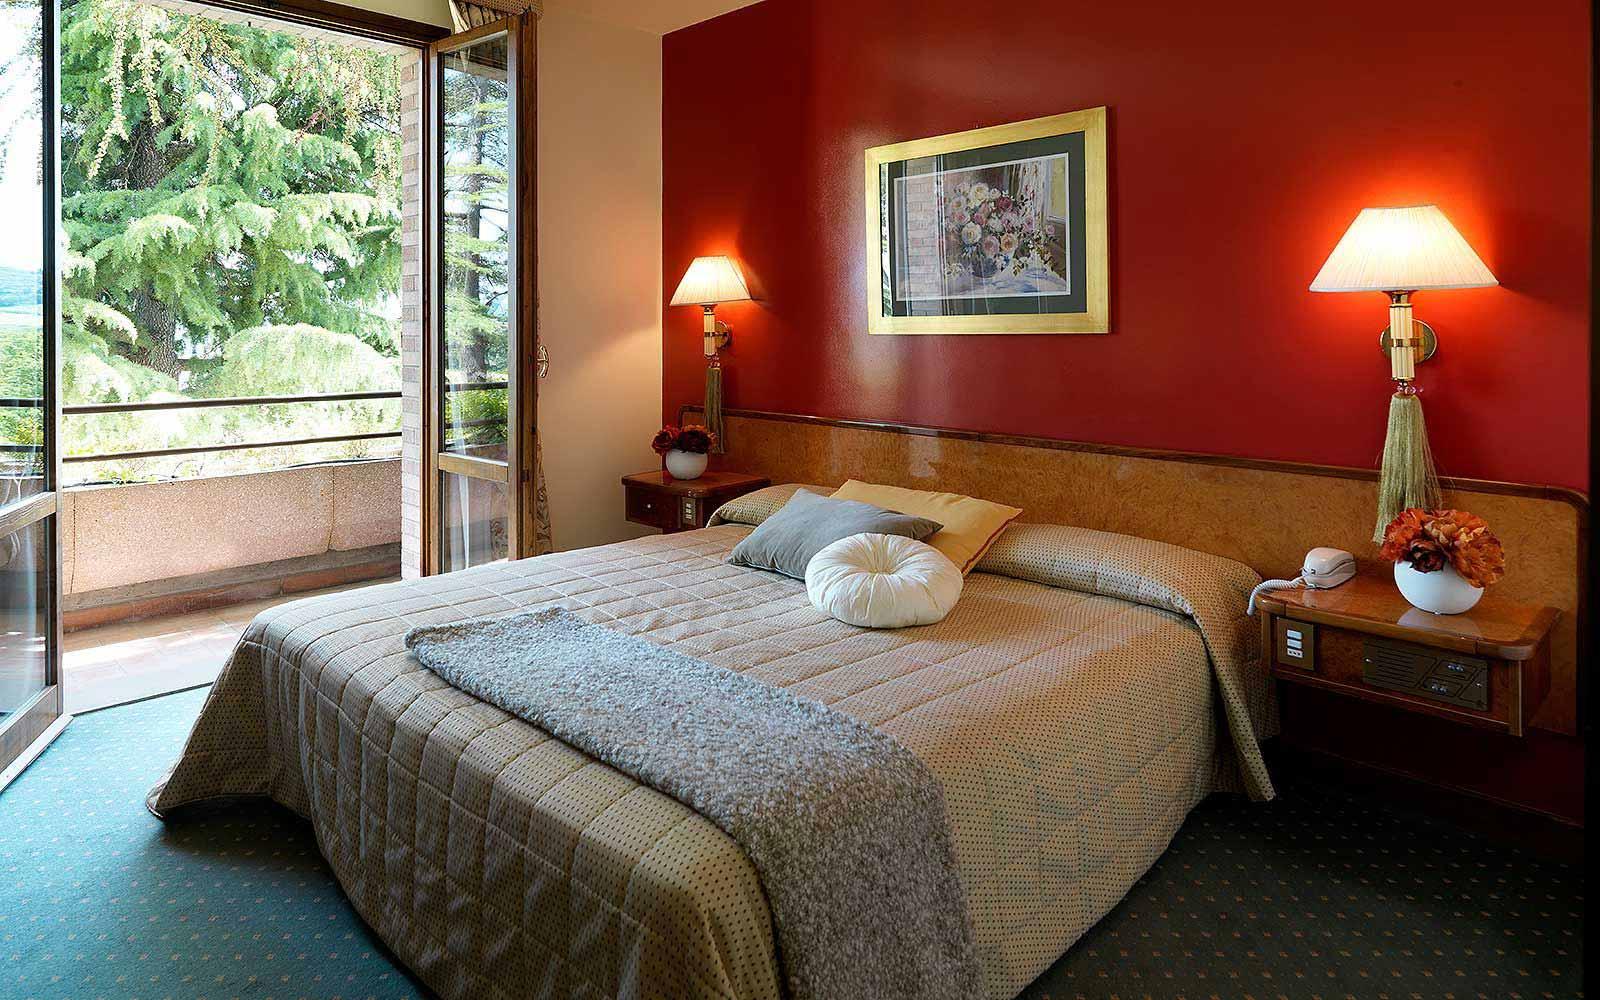 Classic room at Relais Santa Chiara